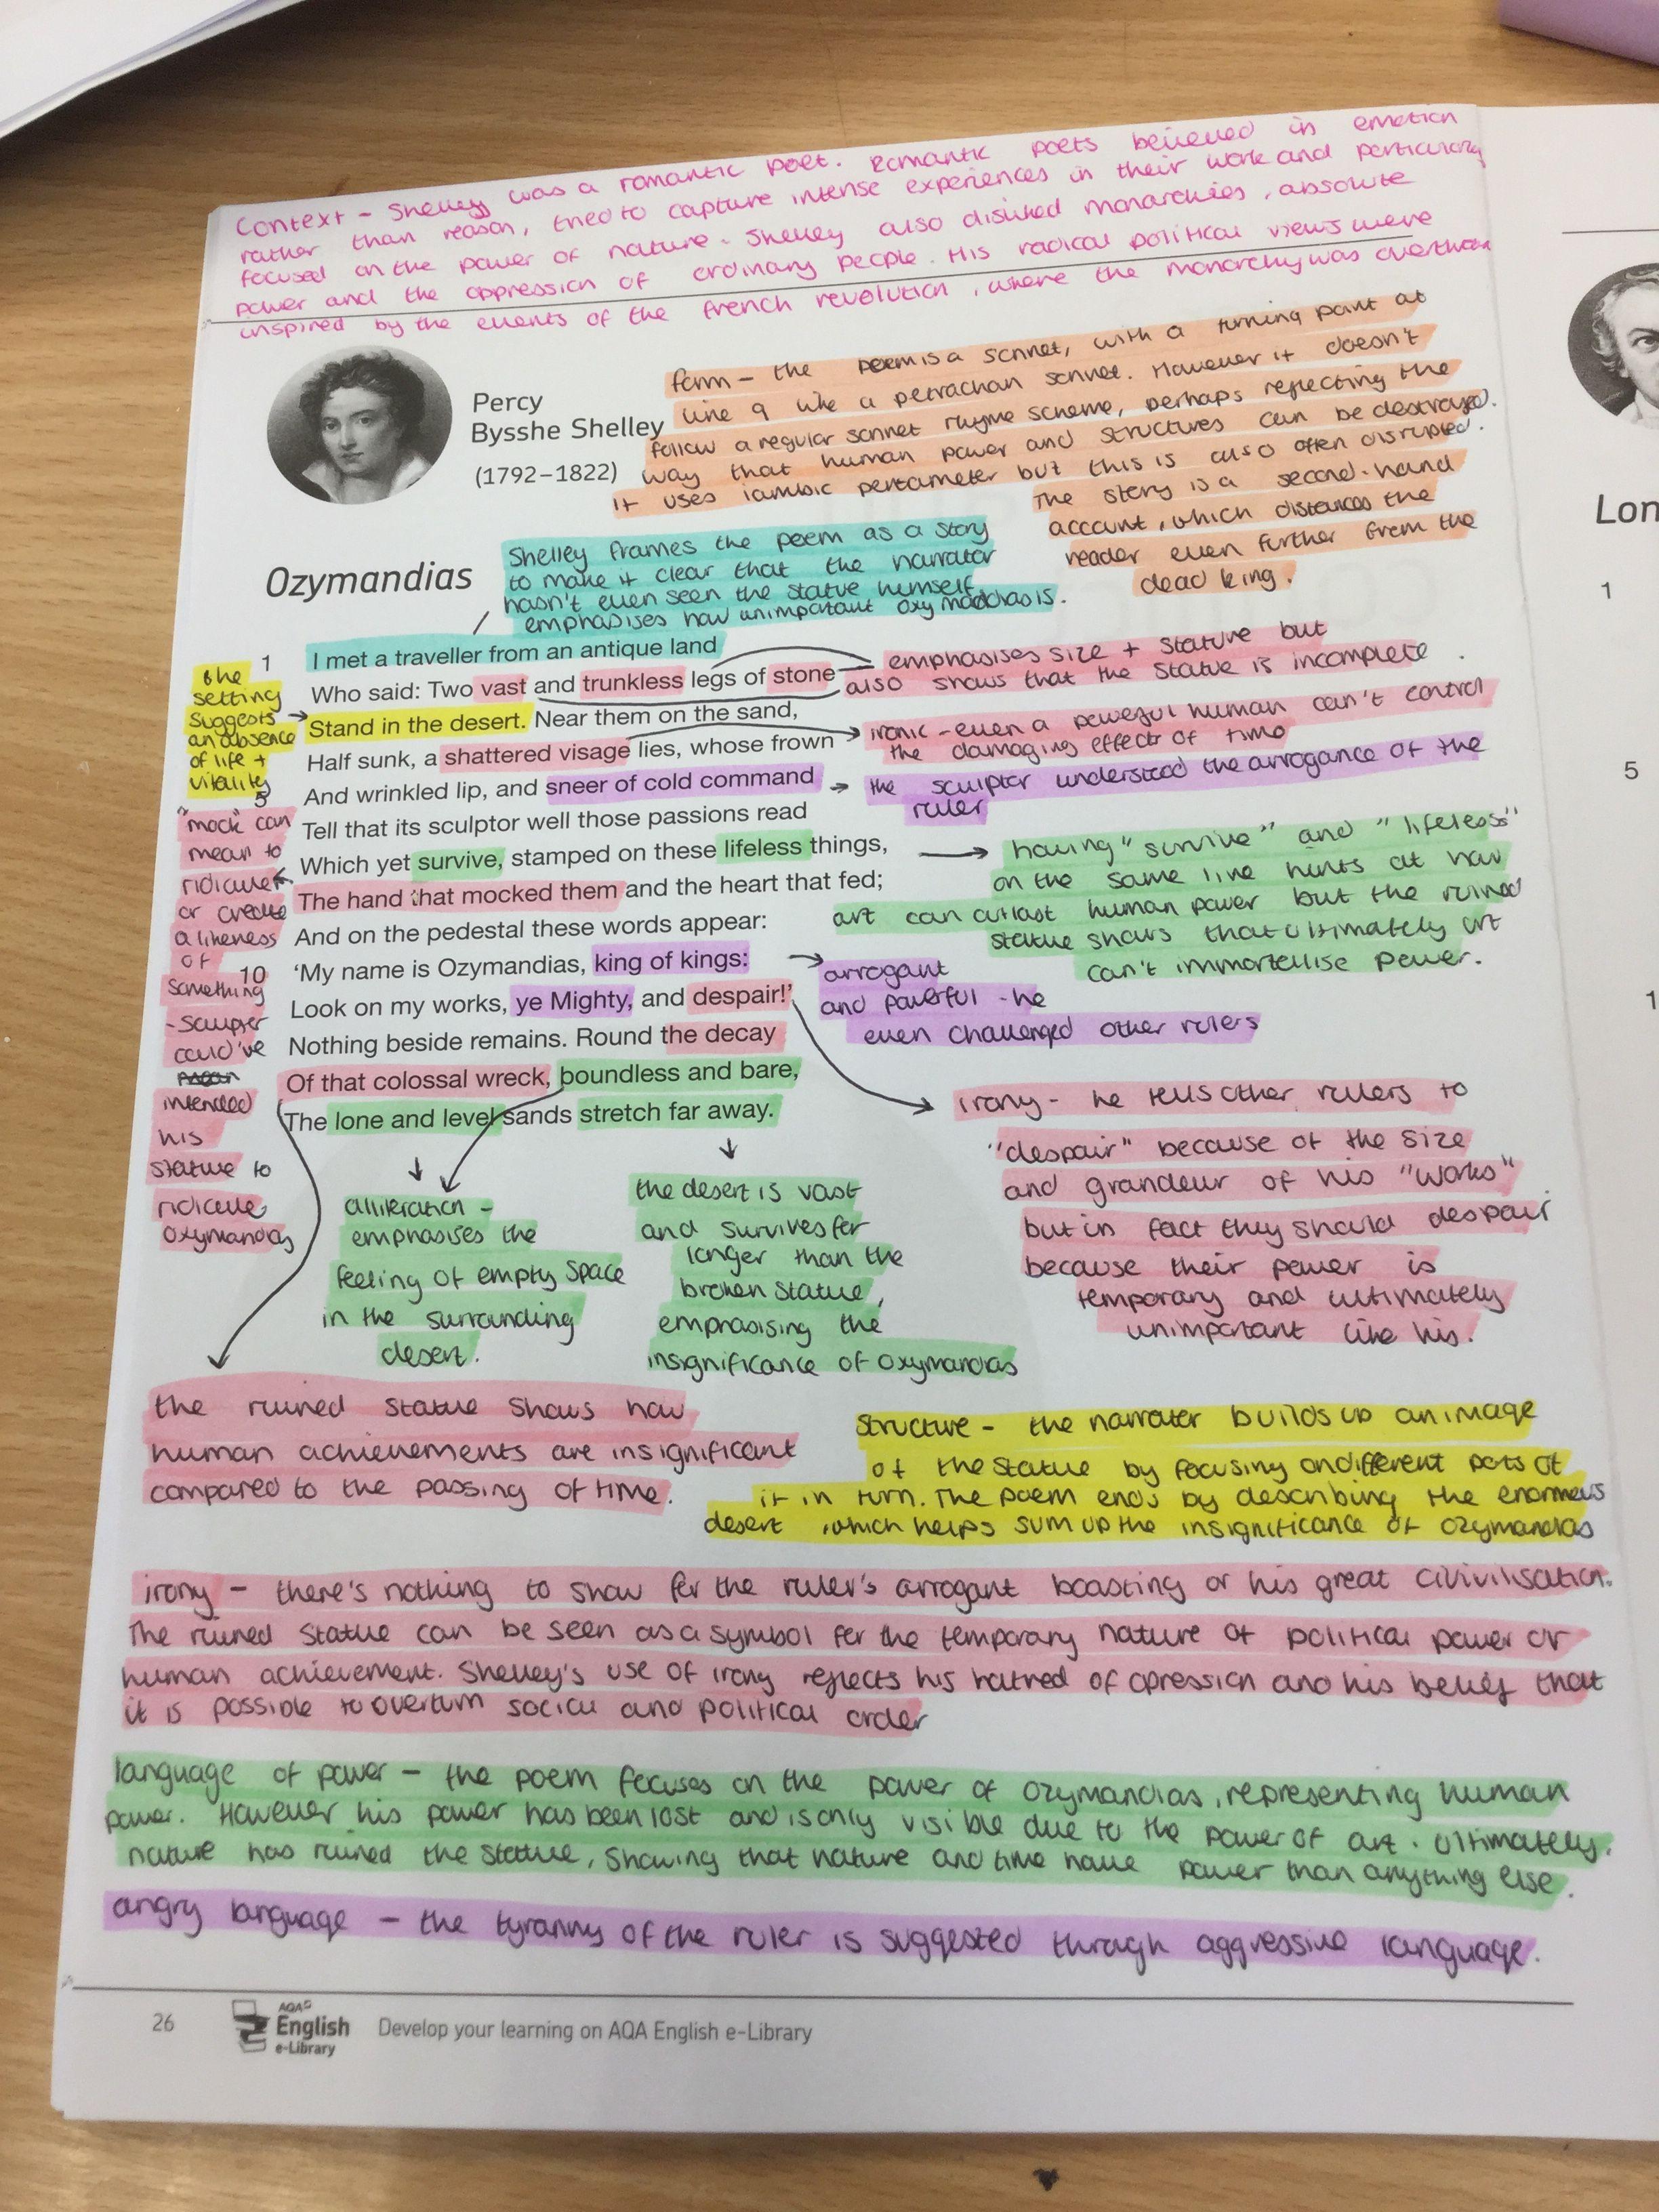 Power And Conflict Poetry Anthology Ozymandia By Percy Bysshe Shelley Dekoration Hausdekoration Hausdeko Gcse English Literature Poem Analysi Poems Theme Of The Pb